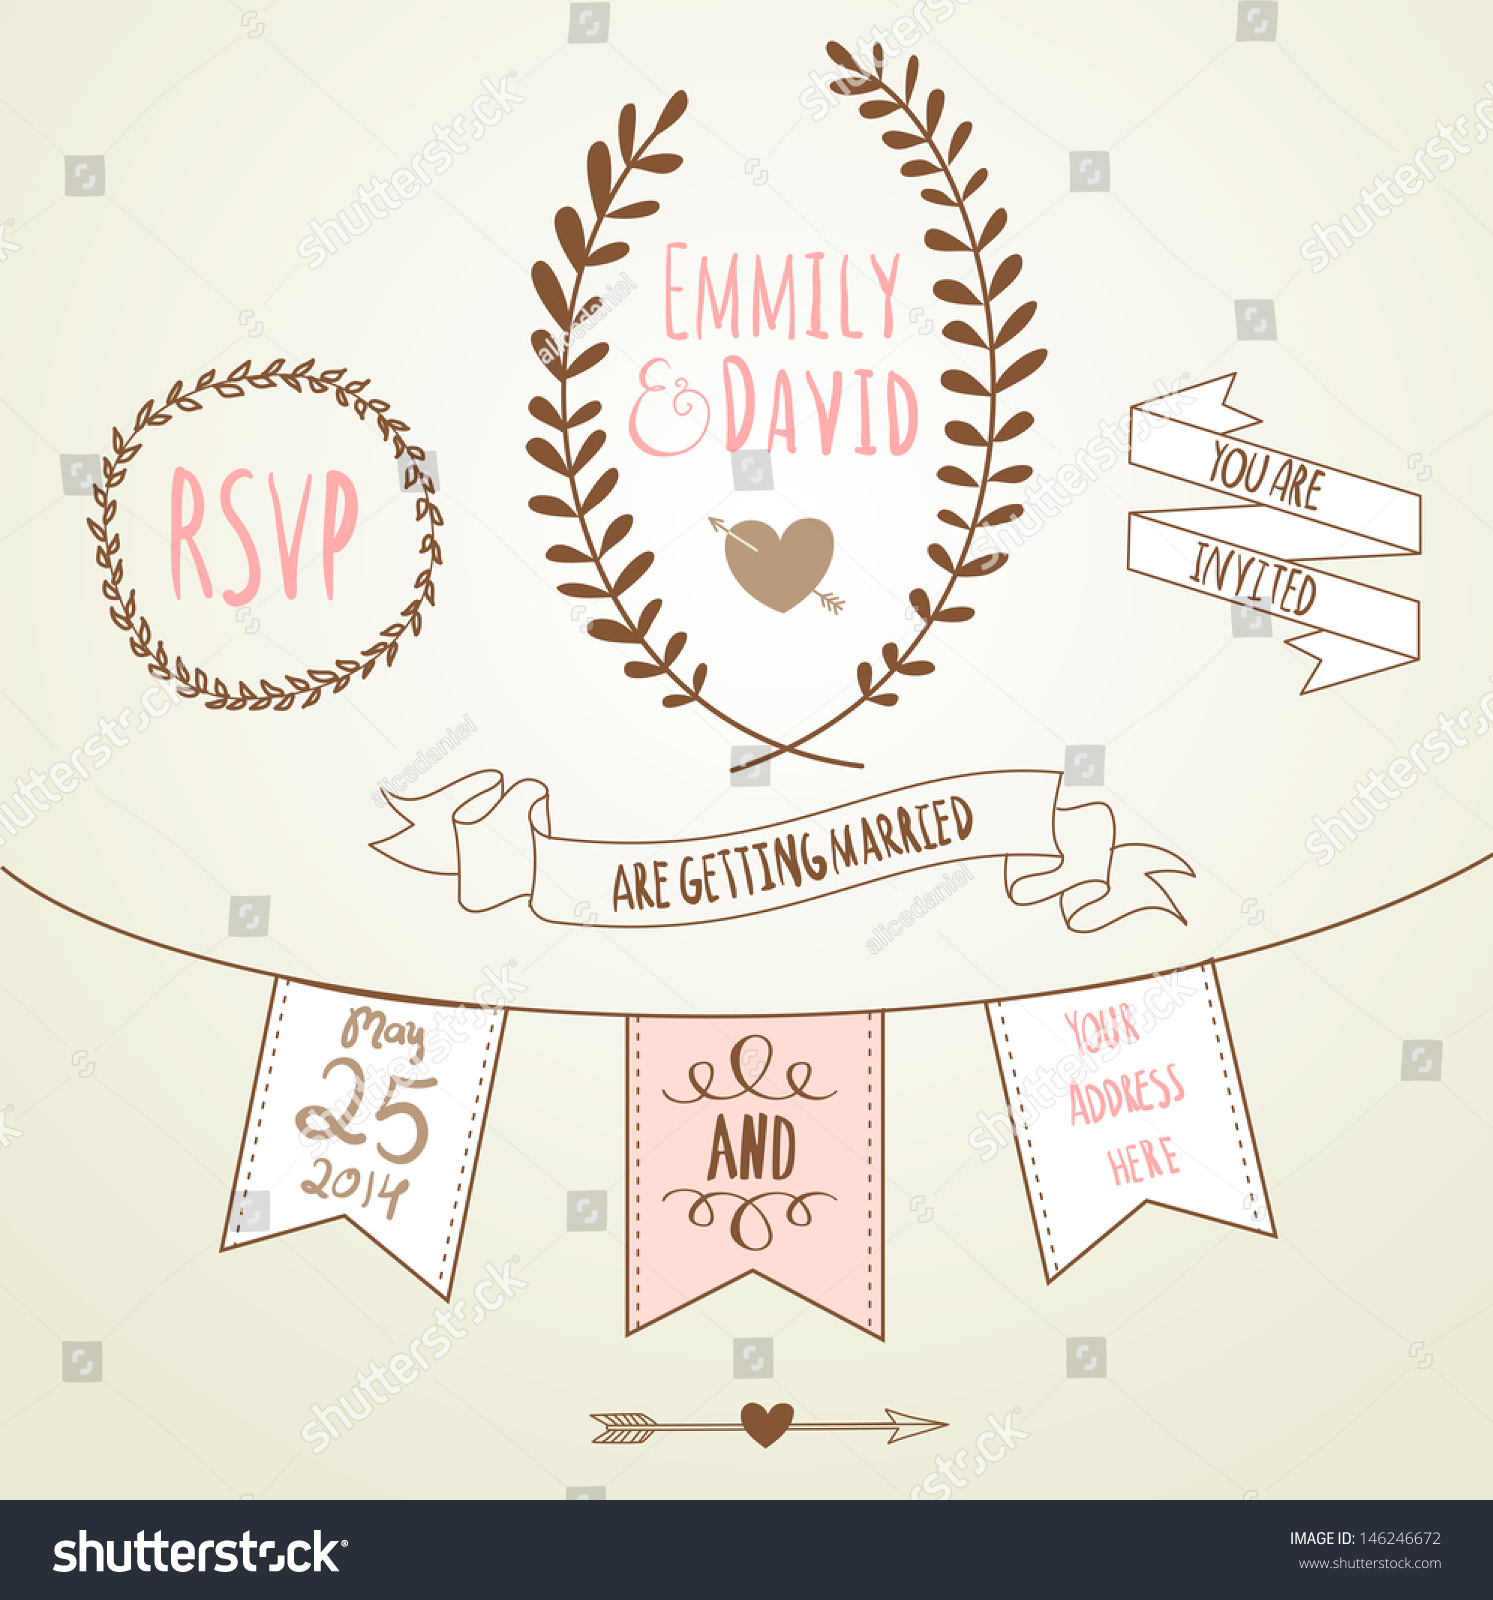 Chalkboard Wedding Invitation Template: Wedding Invitation Template. Chalkboard Style Vector Card